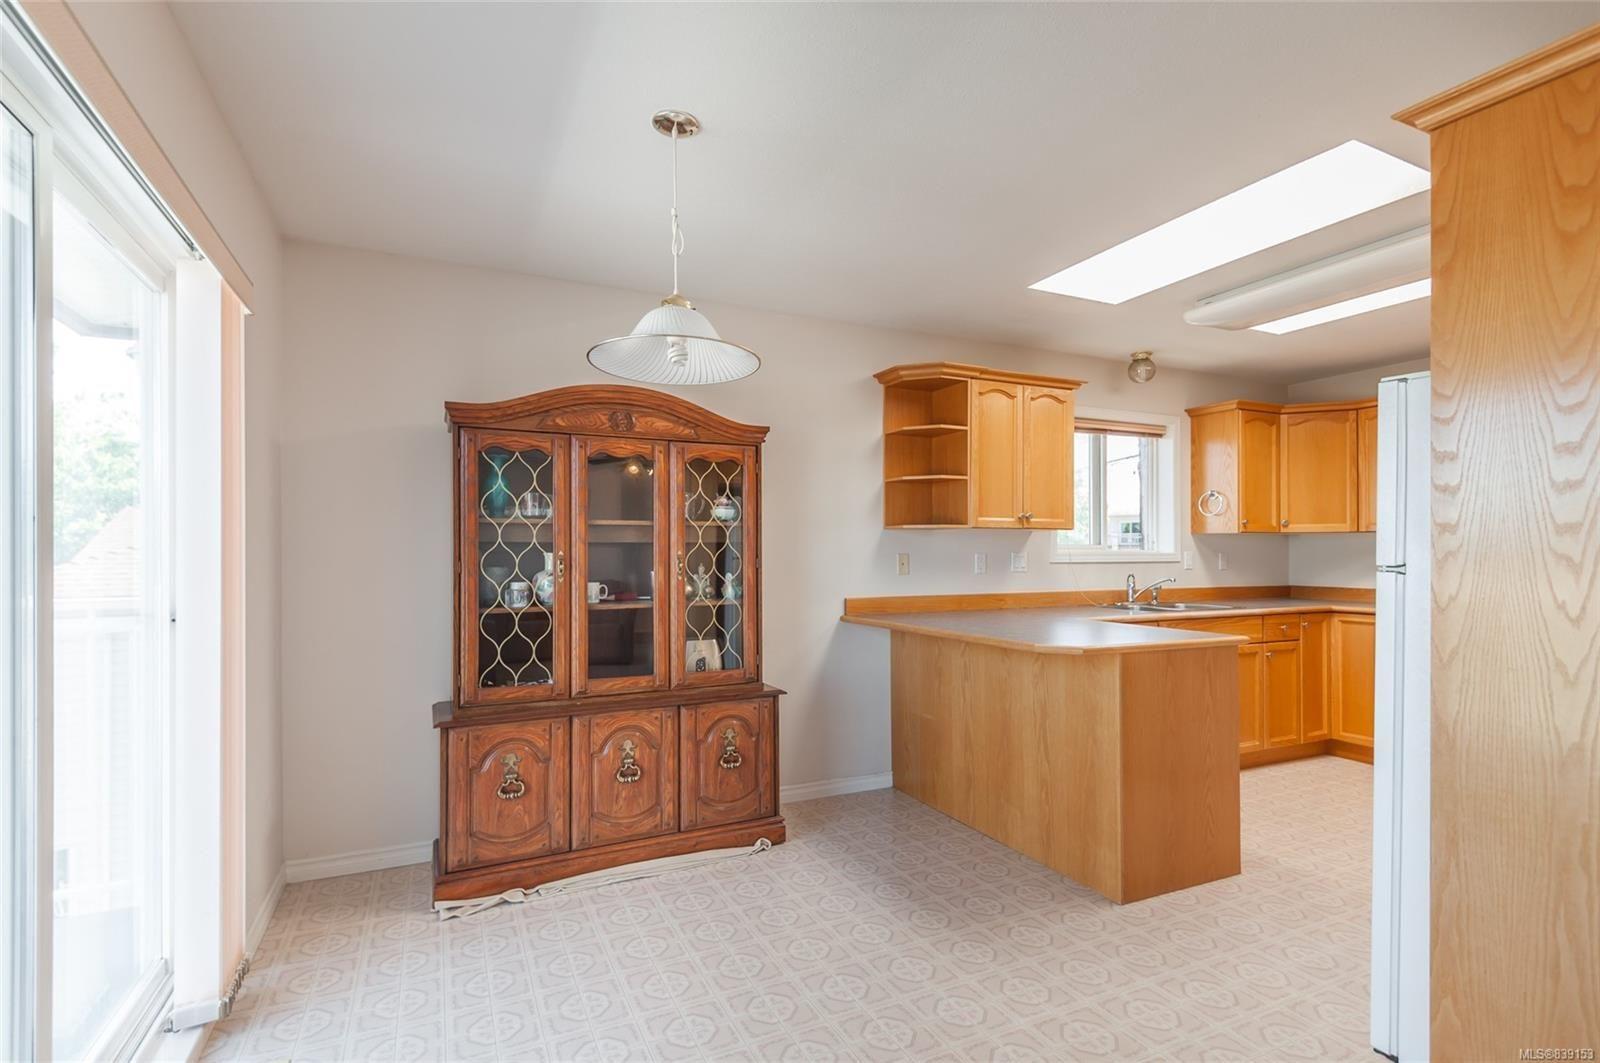 Photo 46: Photos: 6412 Dover Rd in NANAIMO: Na North Nanaimo House for sale (Nanaimo)  : MLS®# 839153